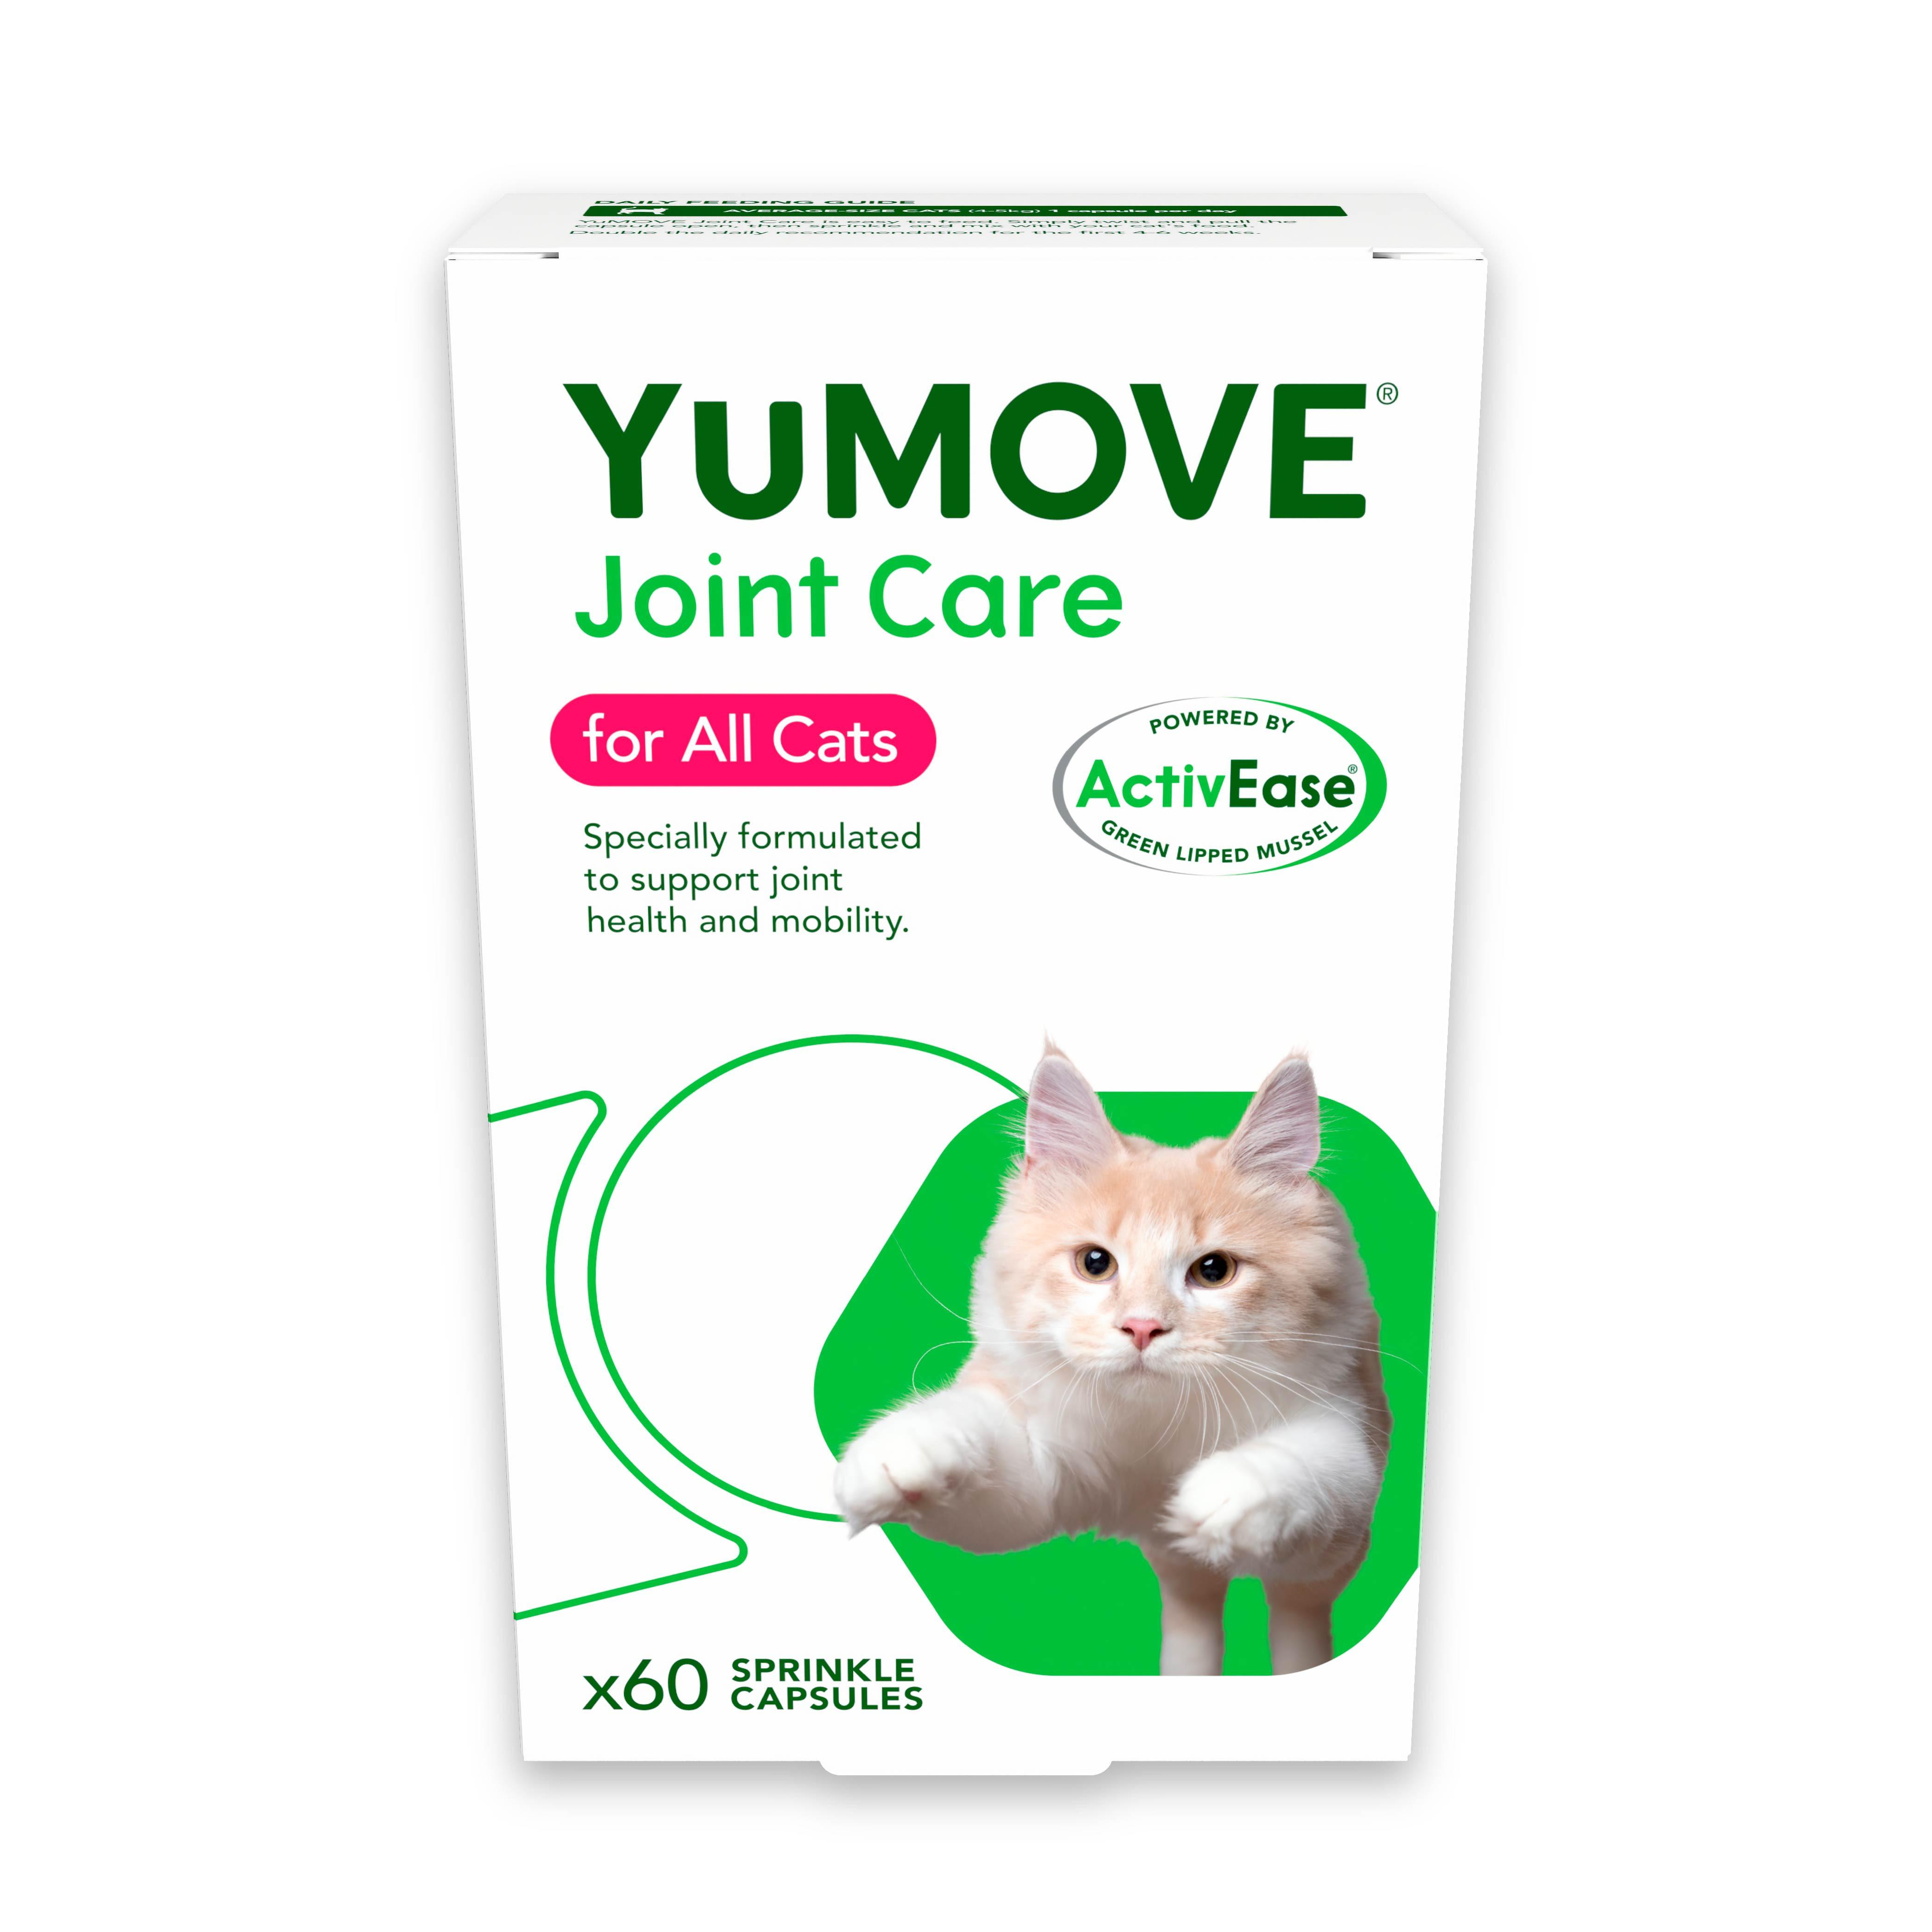 Yumove Cats Pet Supermarket